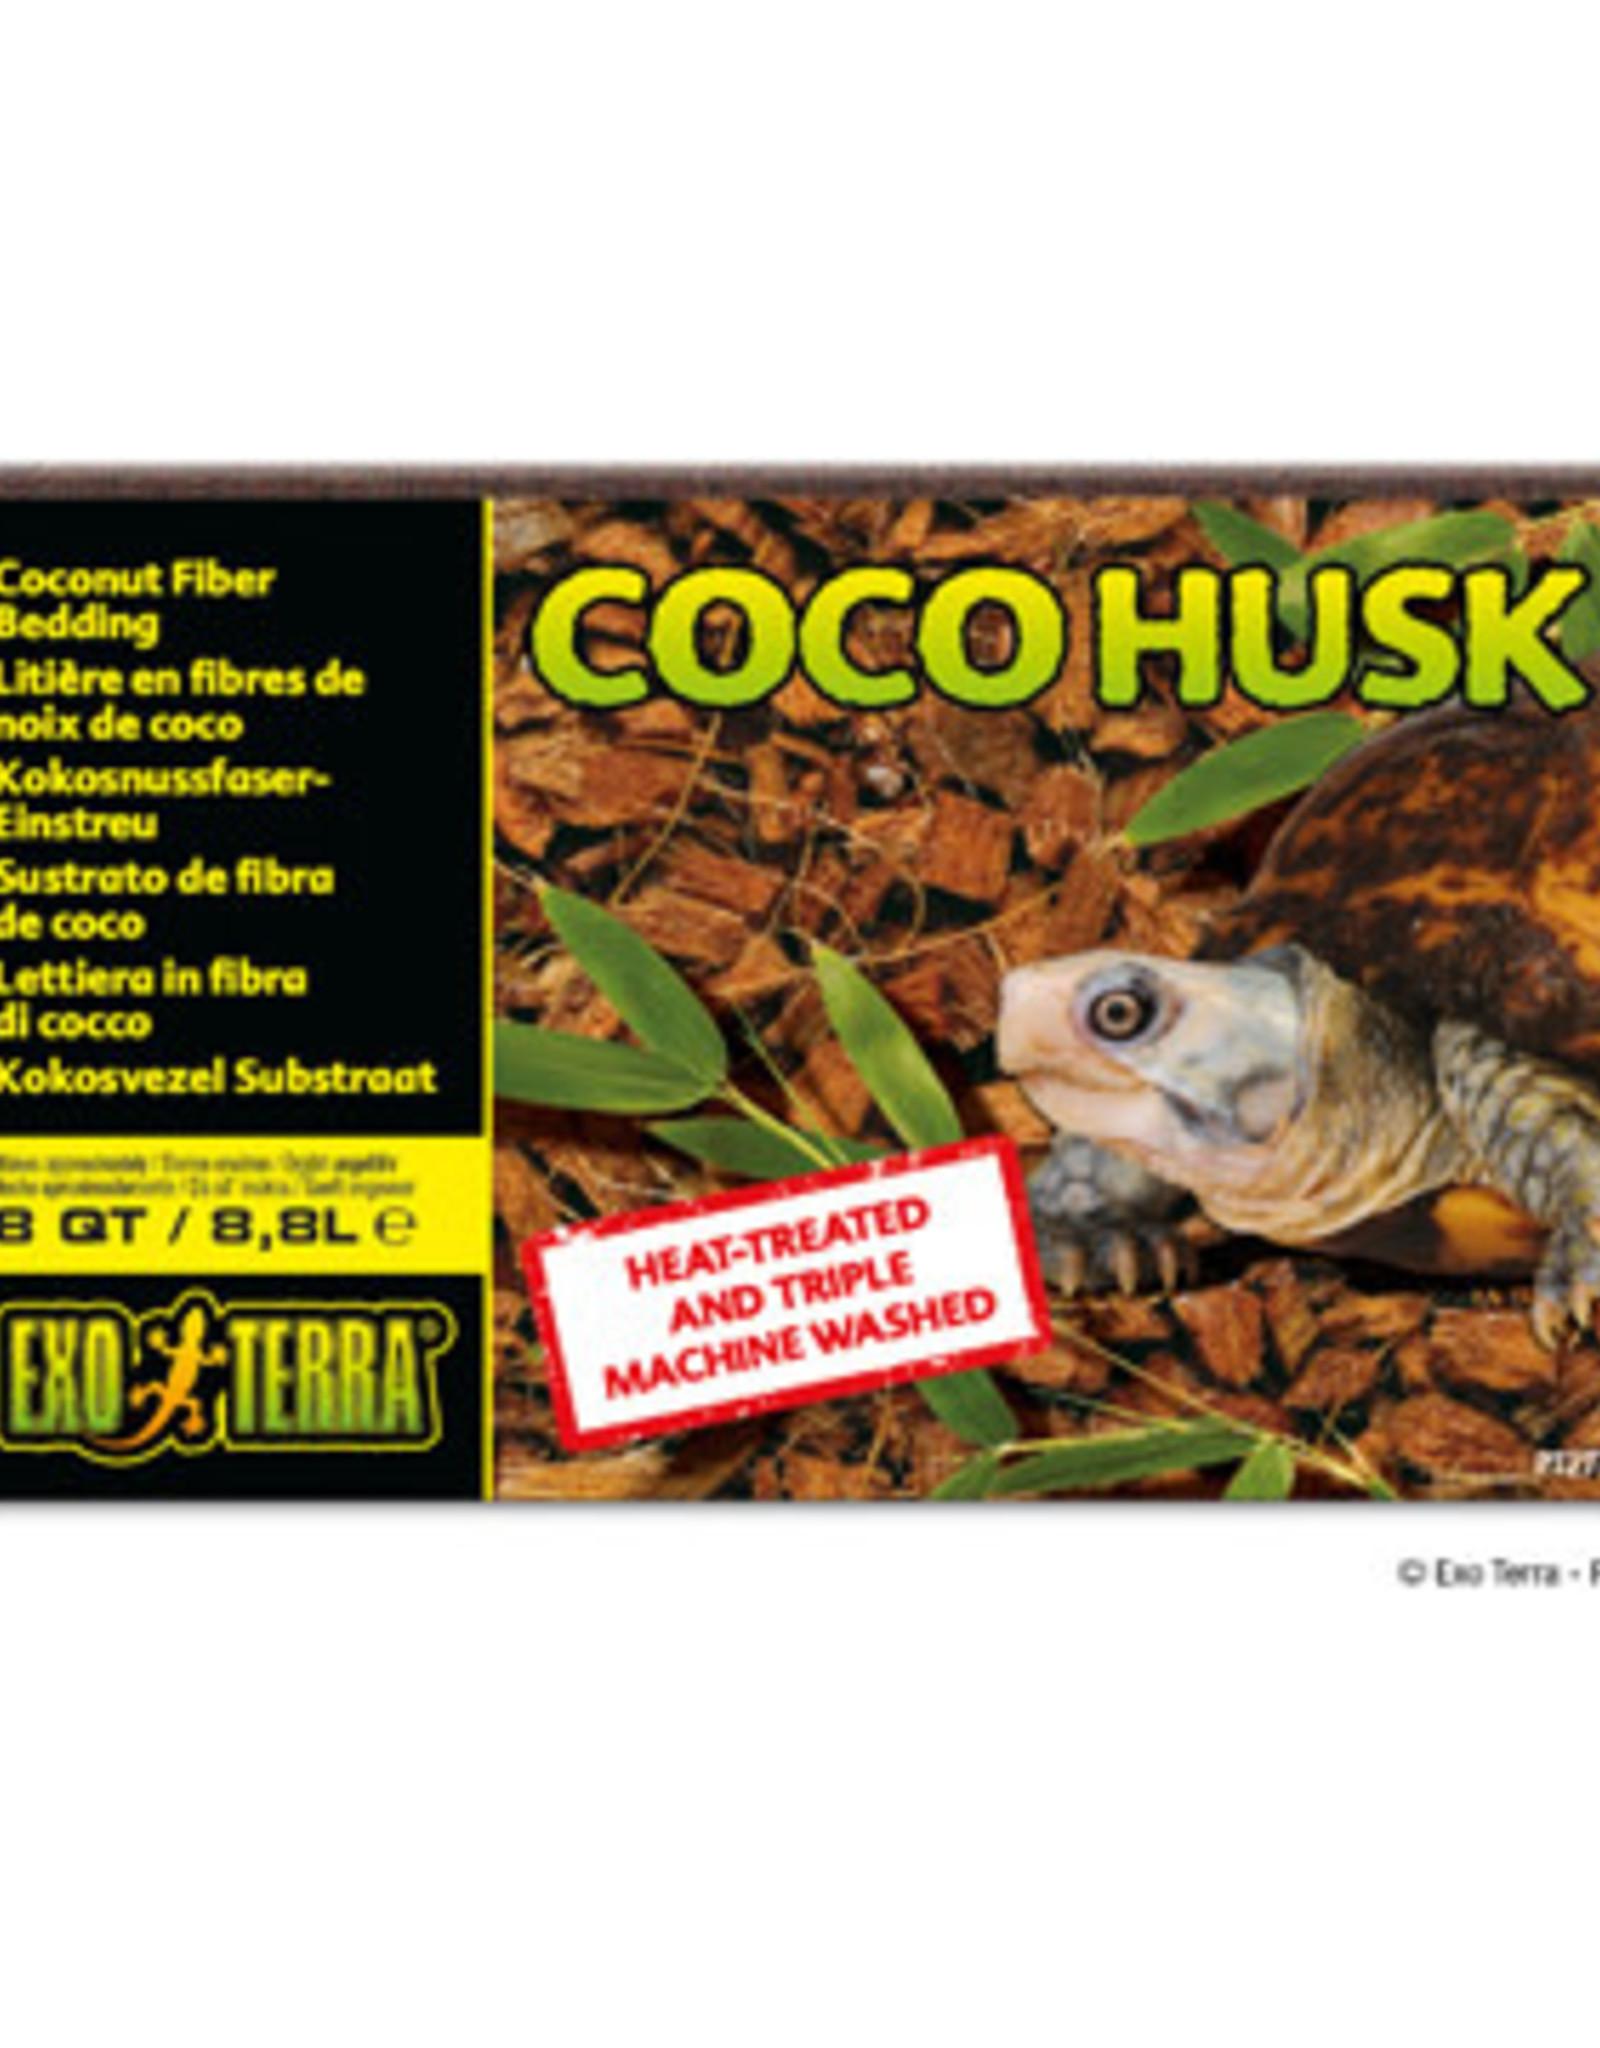 EXO-TERRA Exo Terra Coco Husk - 7 qt (7 L)